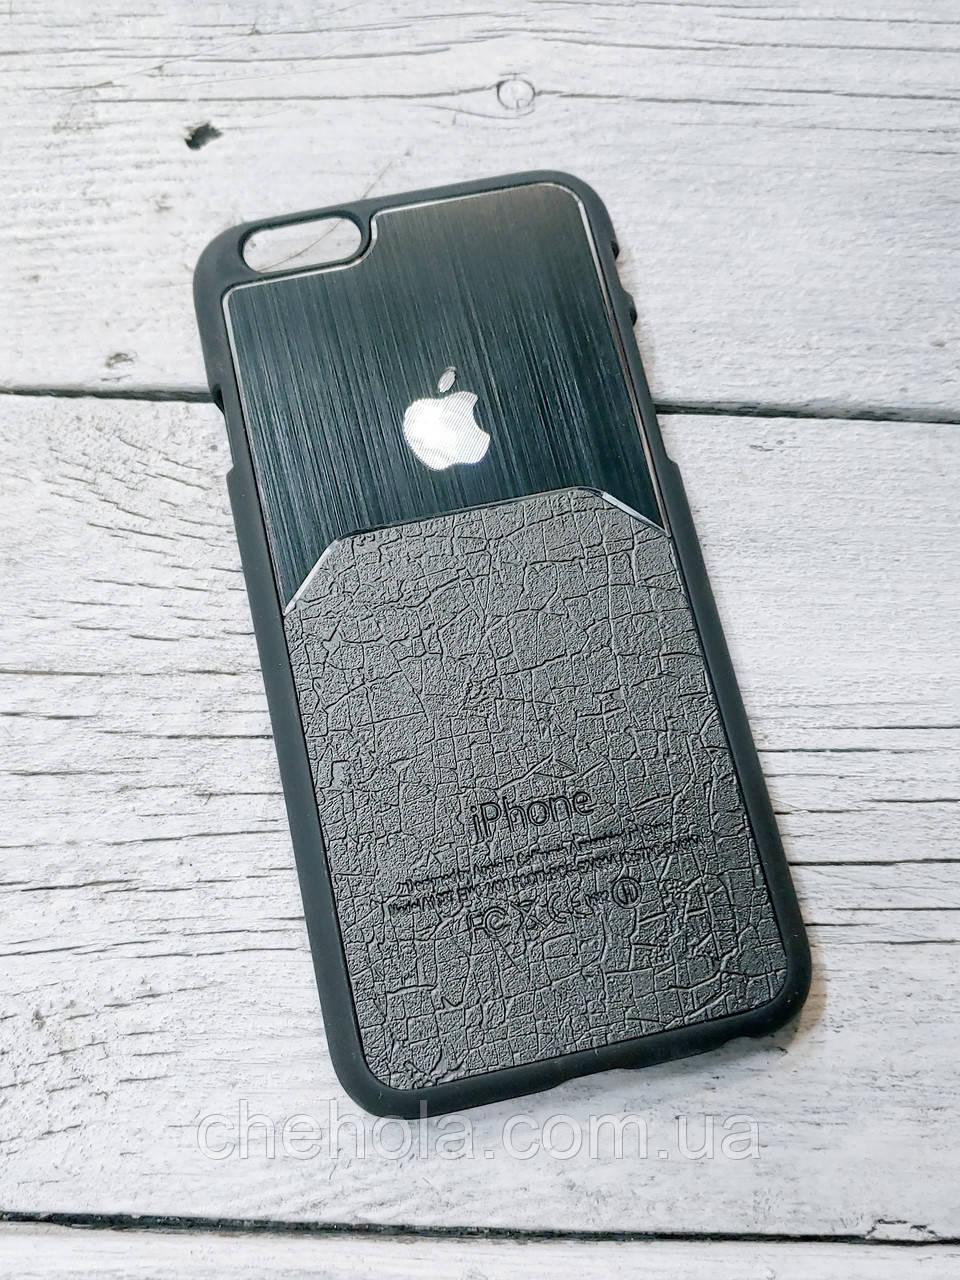 Металевий чохол iphone 6 6s прорезинений